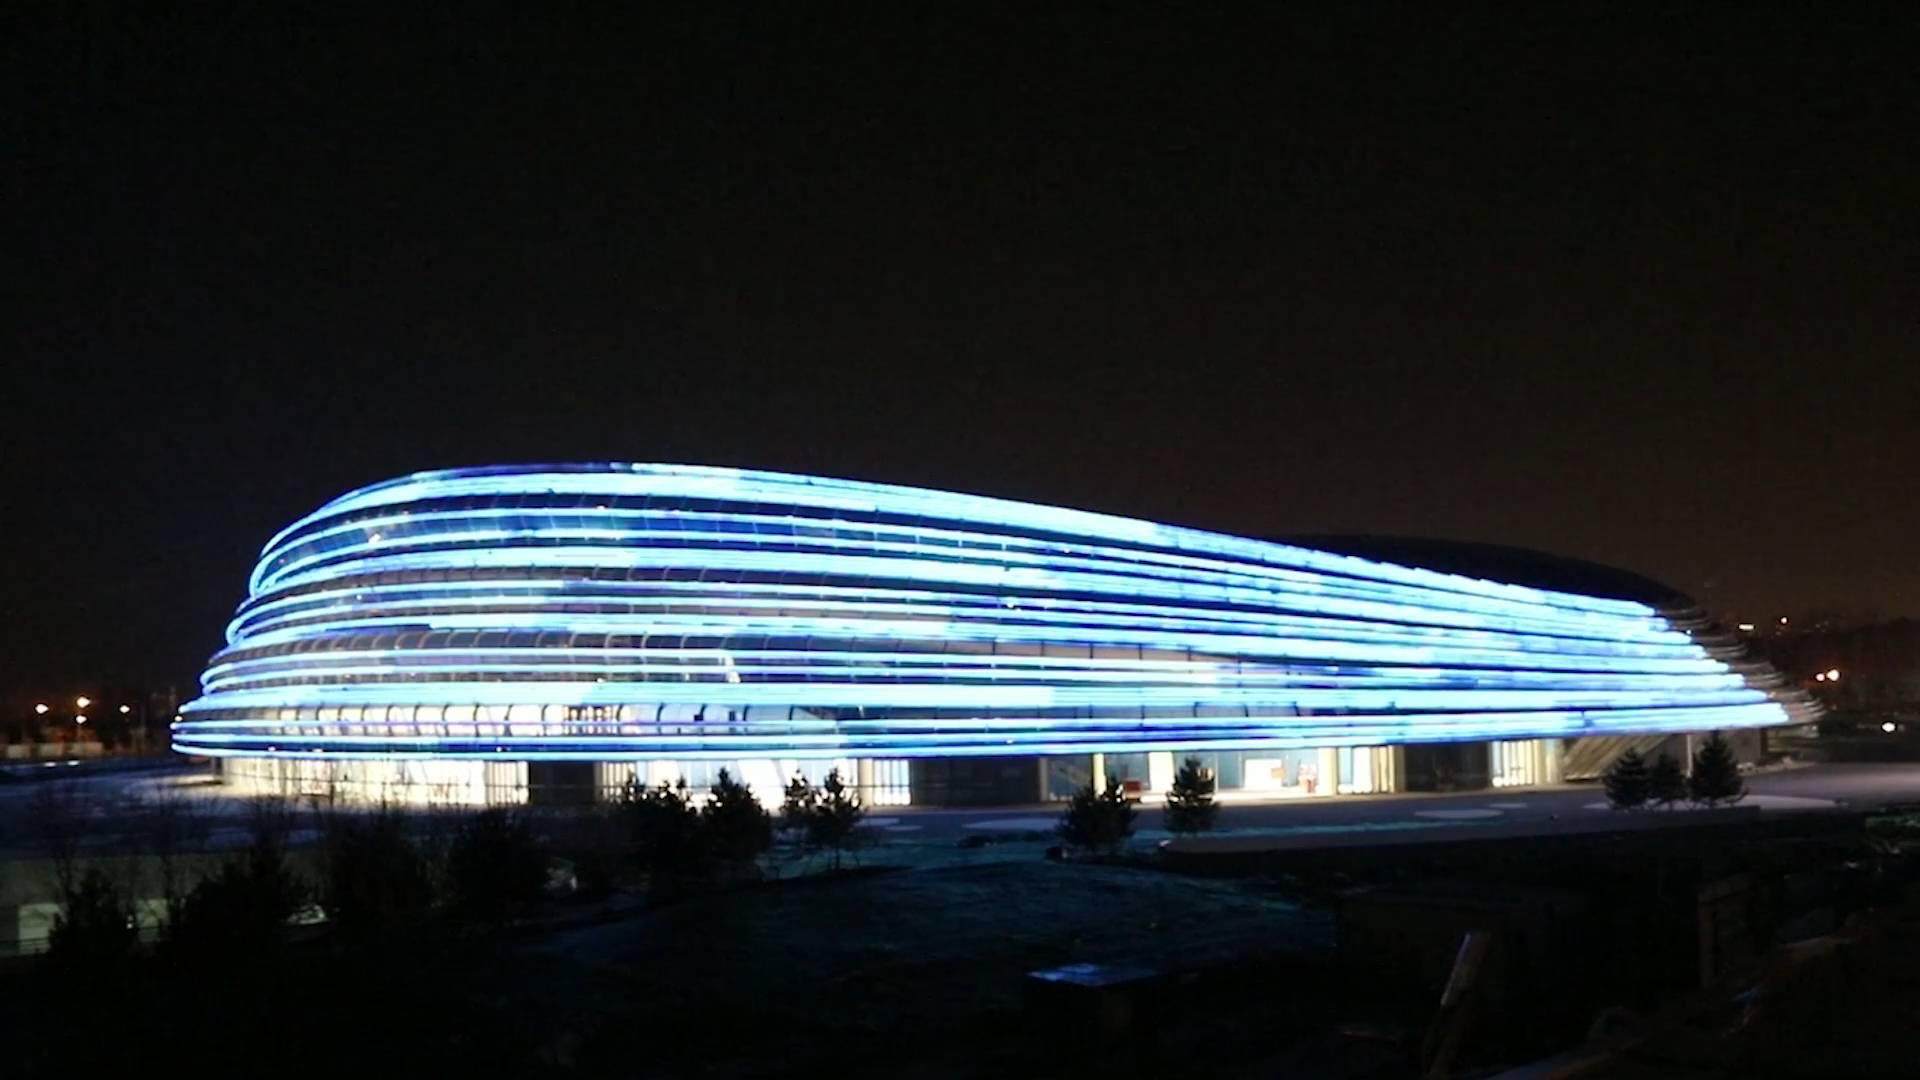 Beijing 2022 Winter Olympics speed skating venue tests lighting system